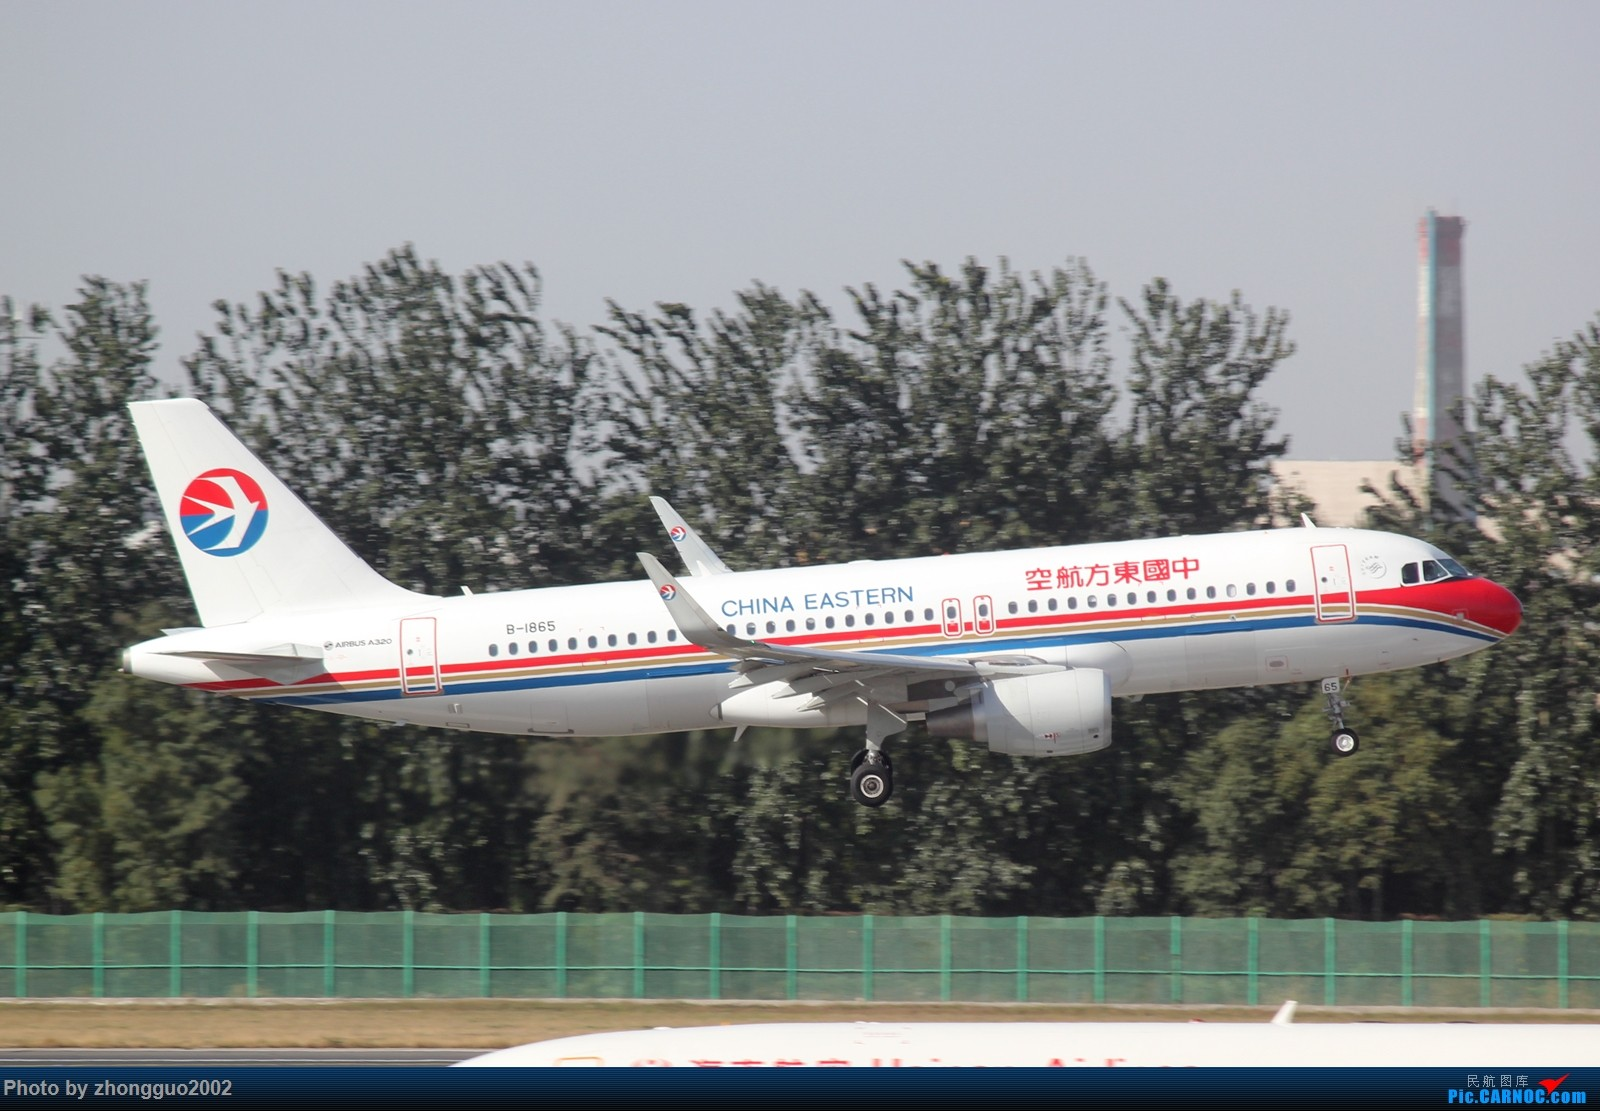 Re:[原创]【BLDDQ--深圳打机队】发小飞机盖楼贴,凡跟帖1字开头大陆民航飞机图的,每图五架小飞机不重复 AIRBUS A320-200 B-1865 中国北京首都国际机场